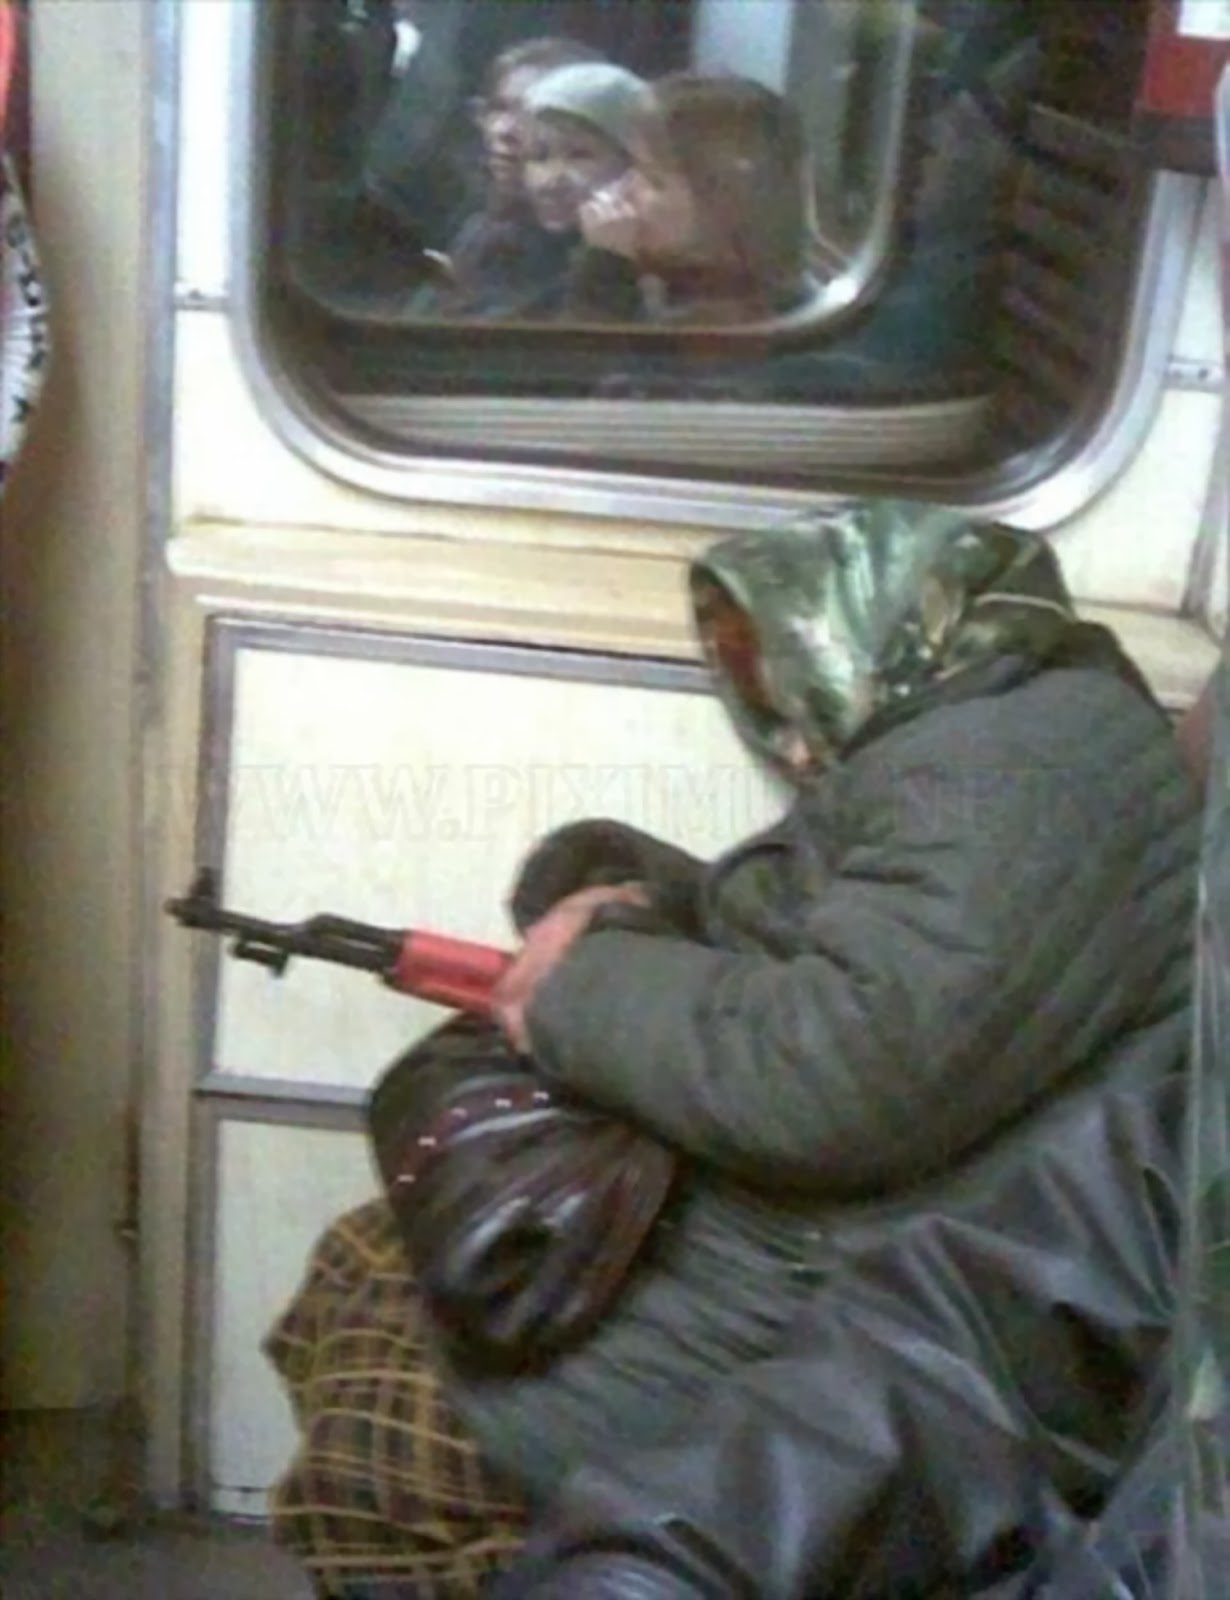 9 Foto Konyol Penumpang Di Angkutan Umum Yang Akan Membuatmu